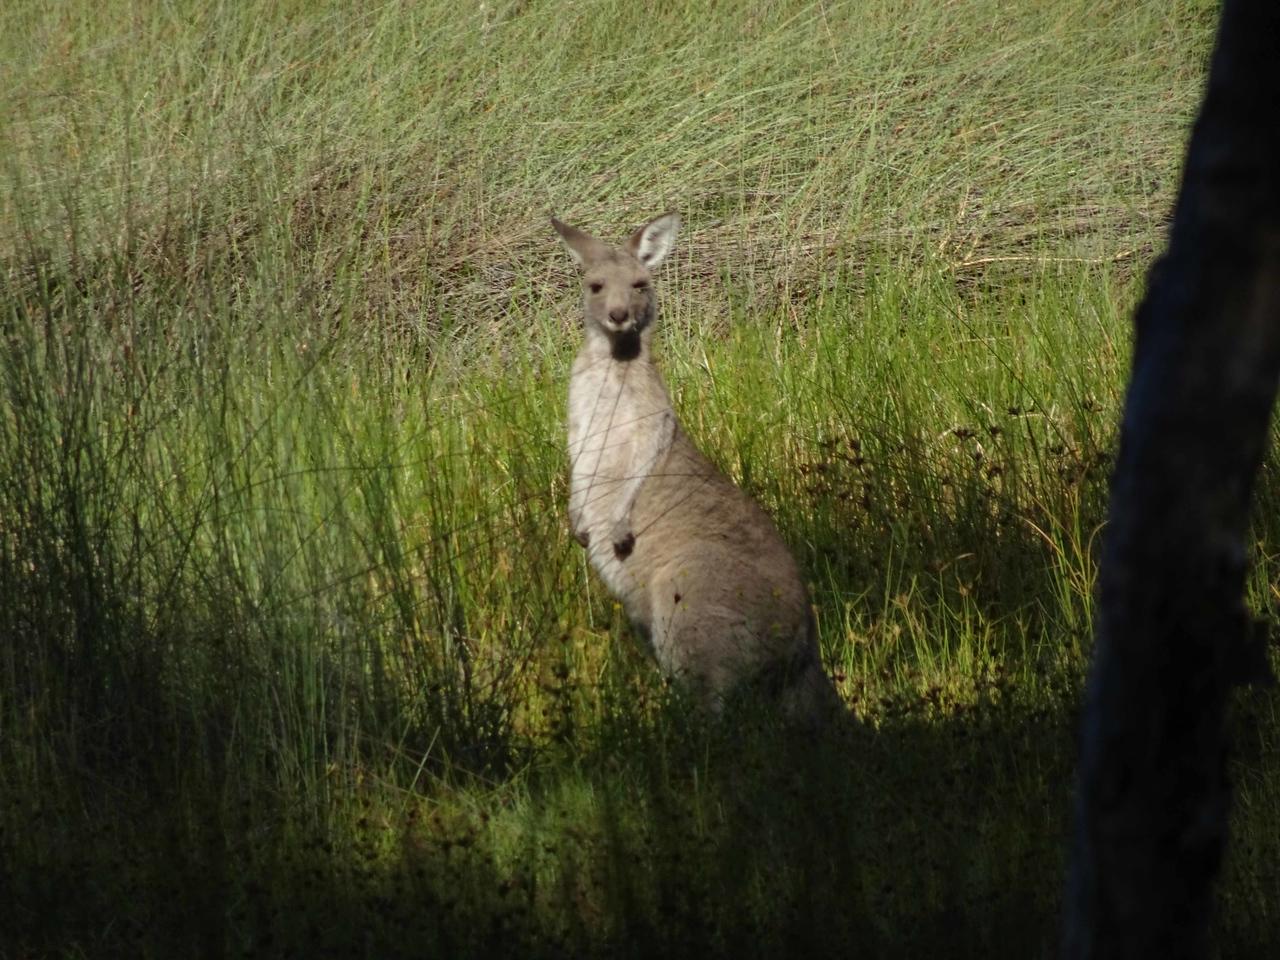 701 A kangeroo near Boomerang Beach